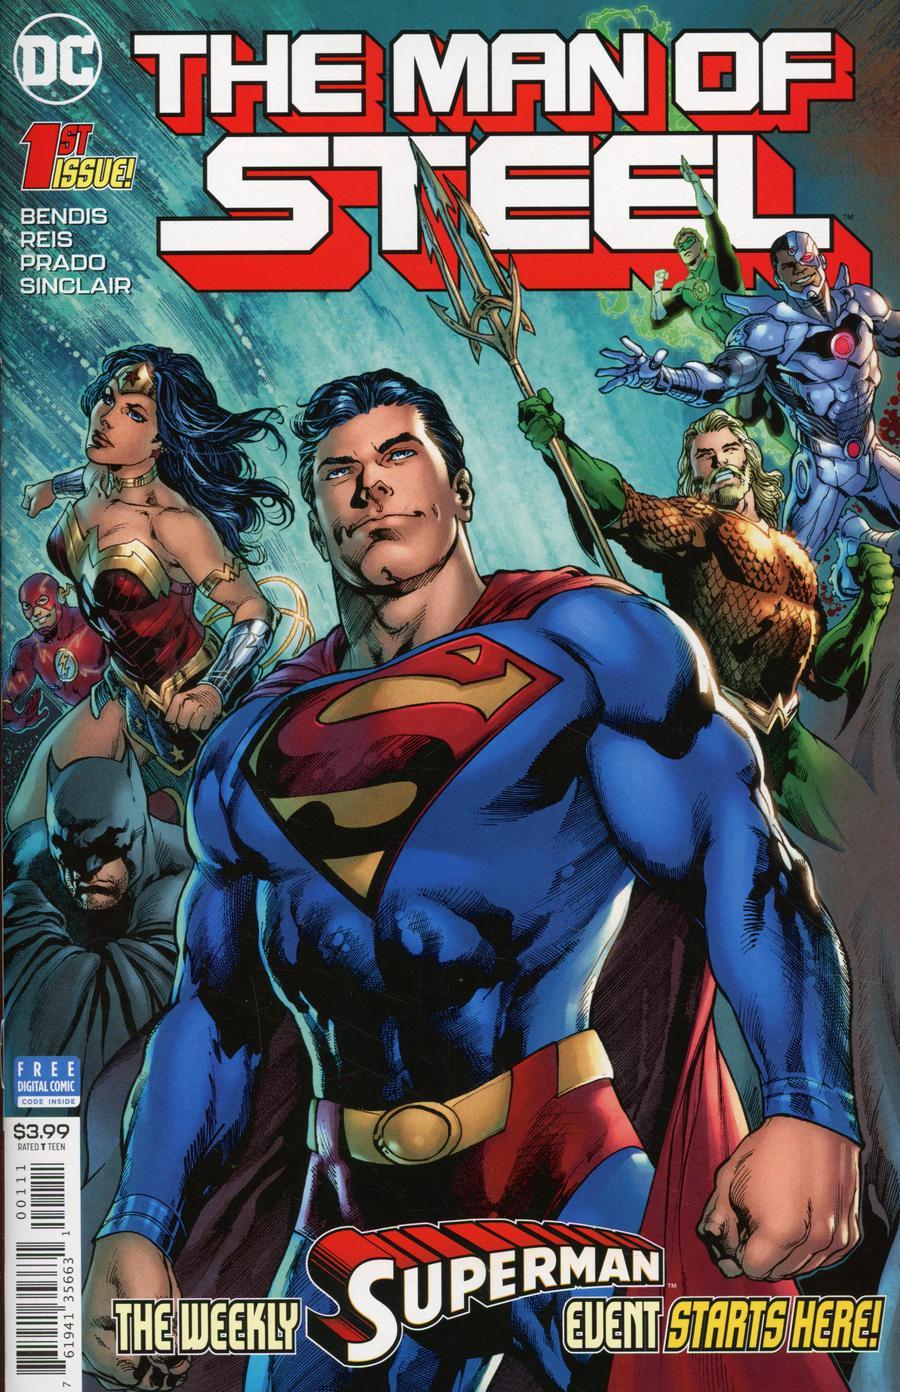 Man Of Steel Vol 2 #1 Cover A Regular Ivan Reis & Joe Prado Cover